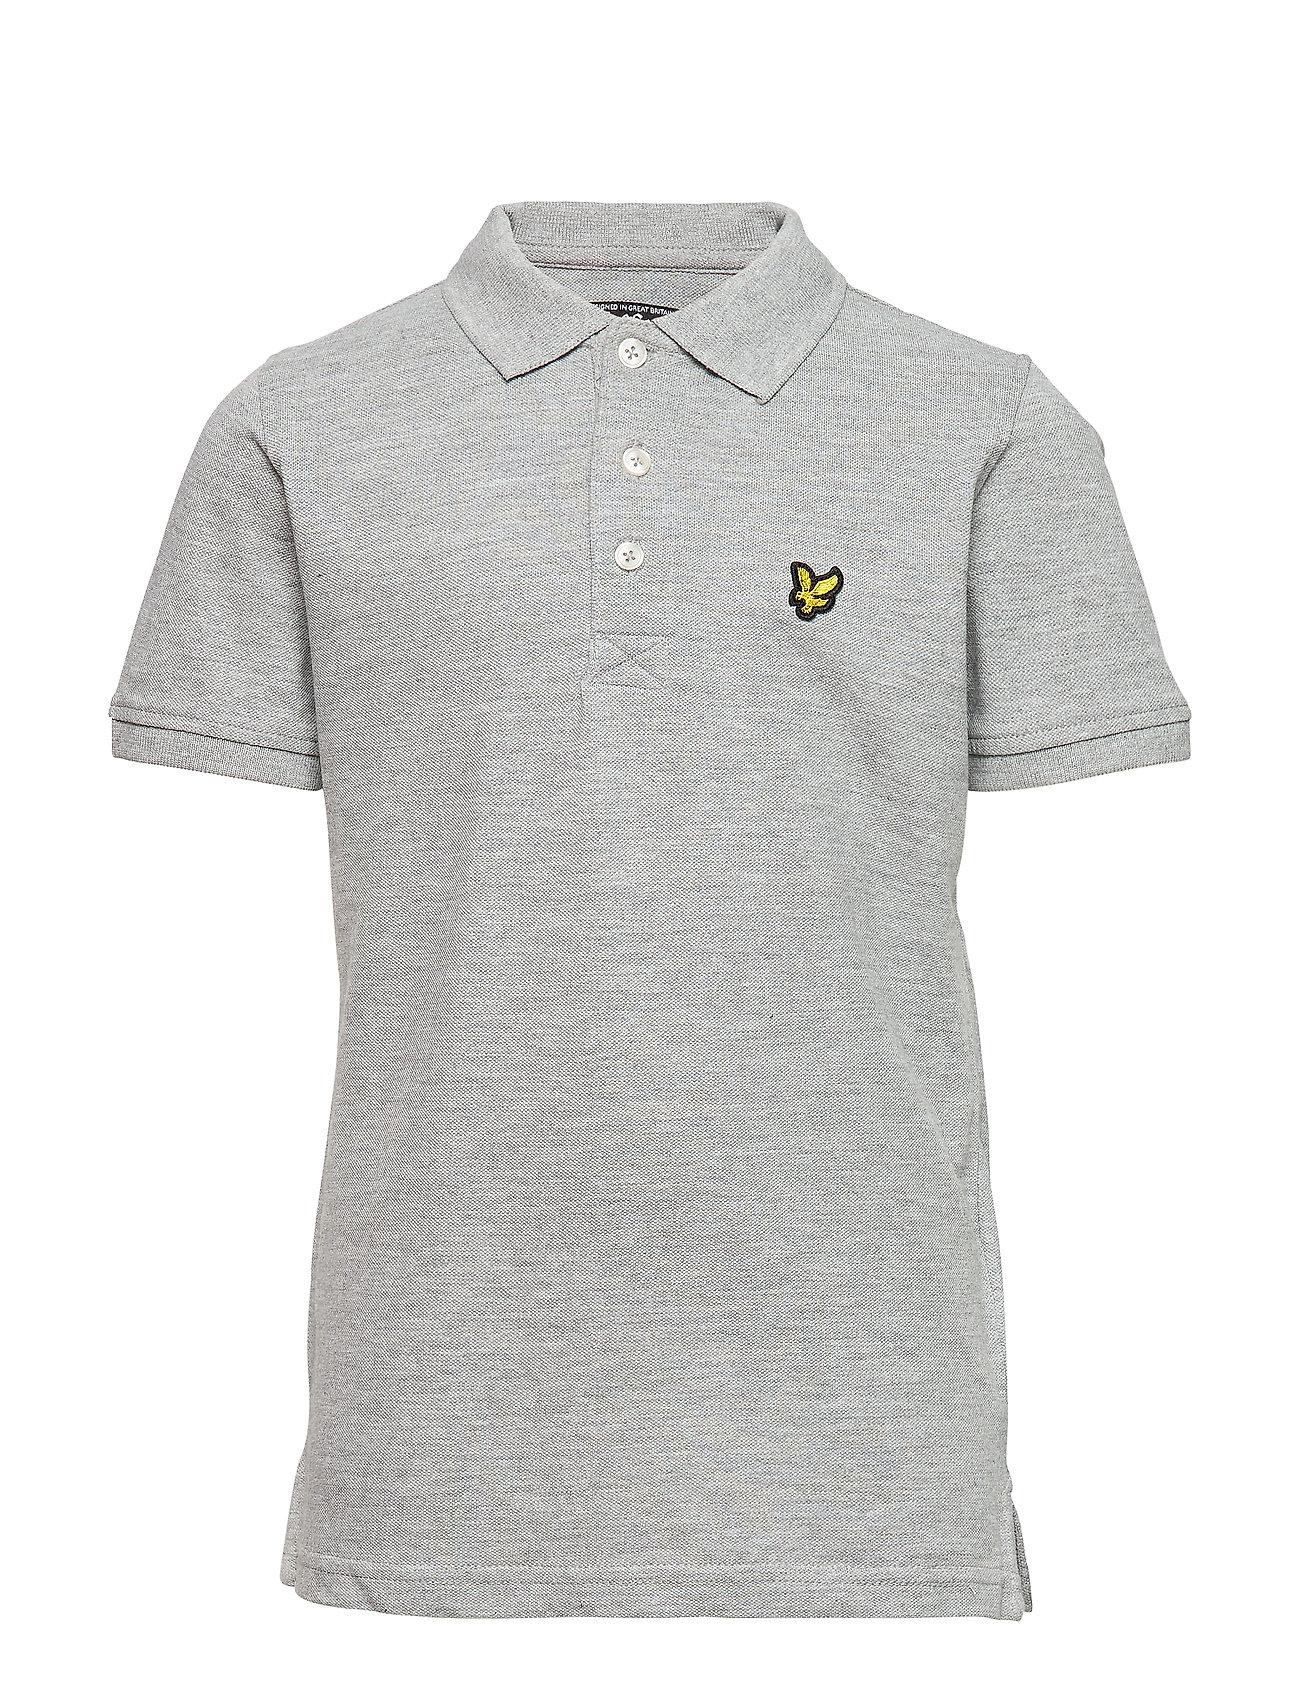 Lyle & Scott Junior Classic Polo Shirt - VINTAGE GREY HEATHER